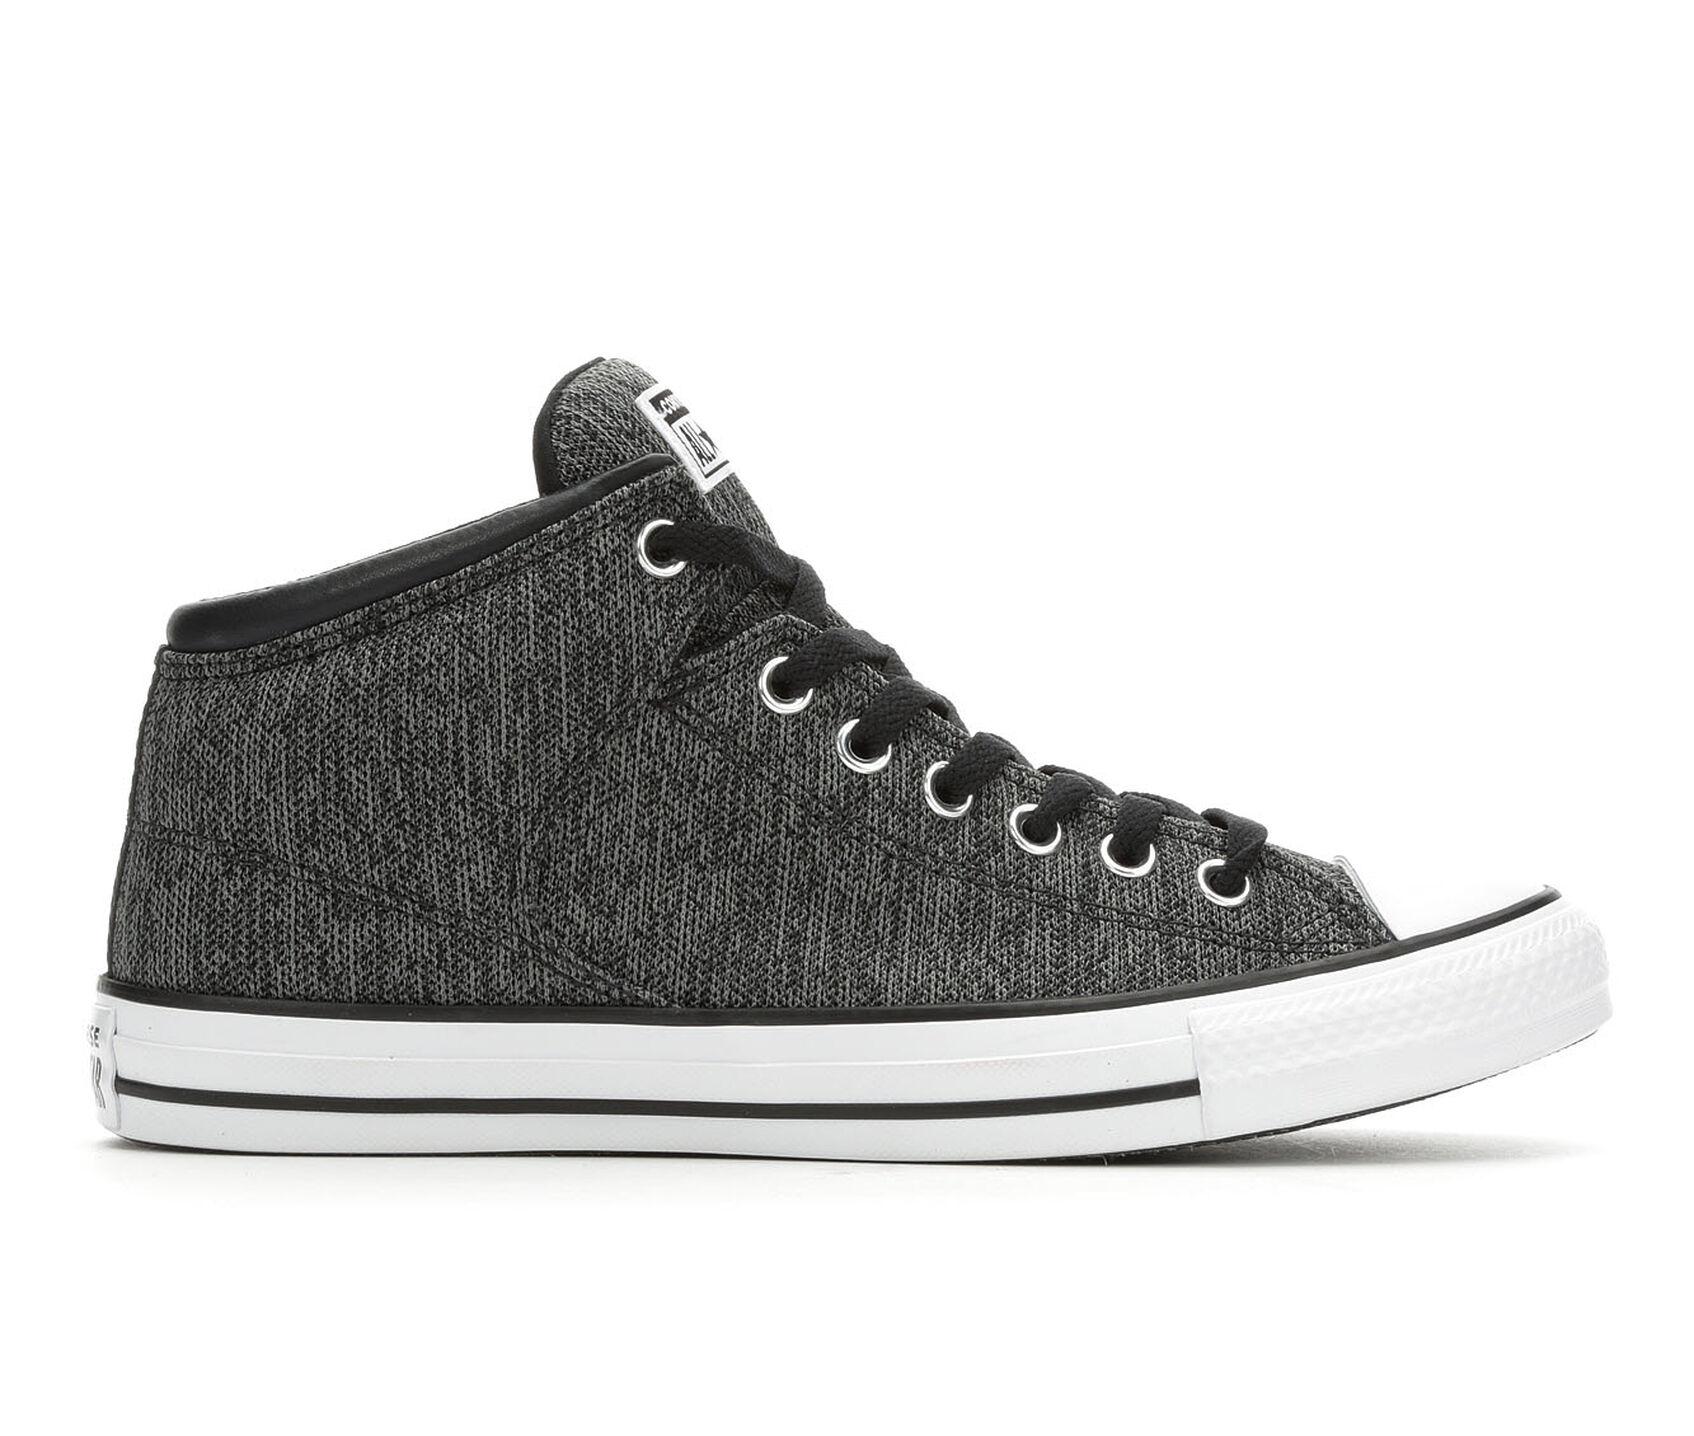 ee580c1dea71 ... Converse CTAS Hi St Varsity Sneakers. Previous